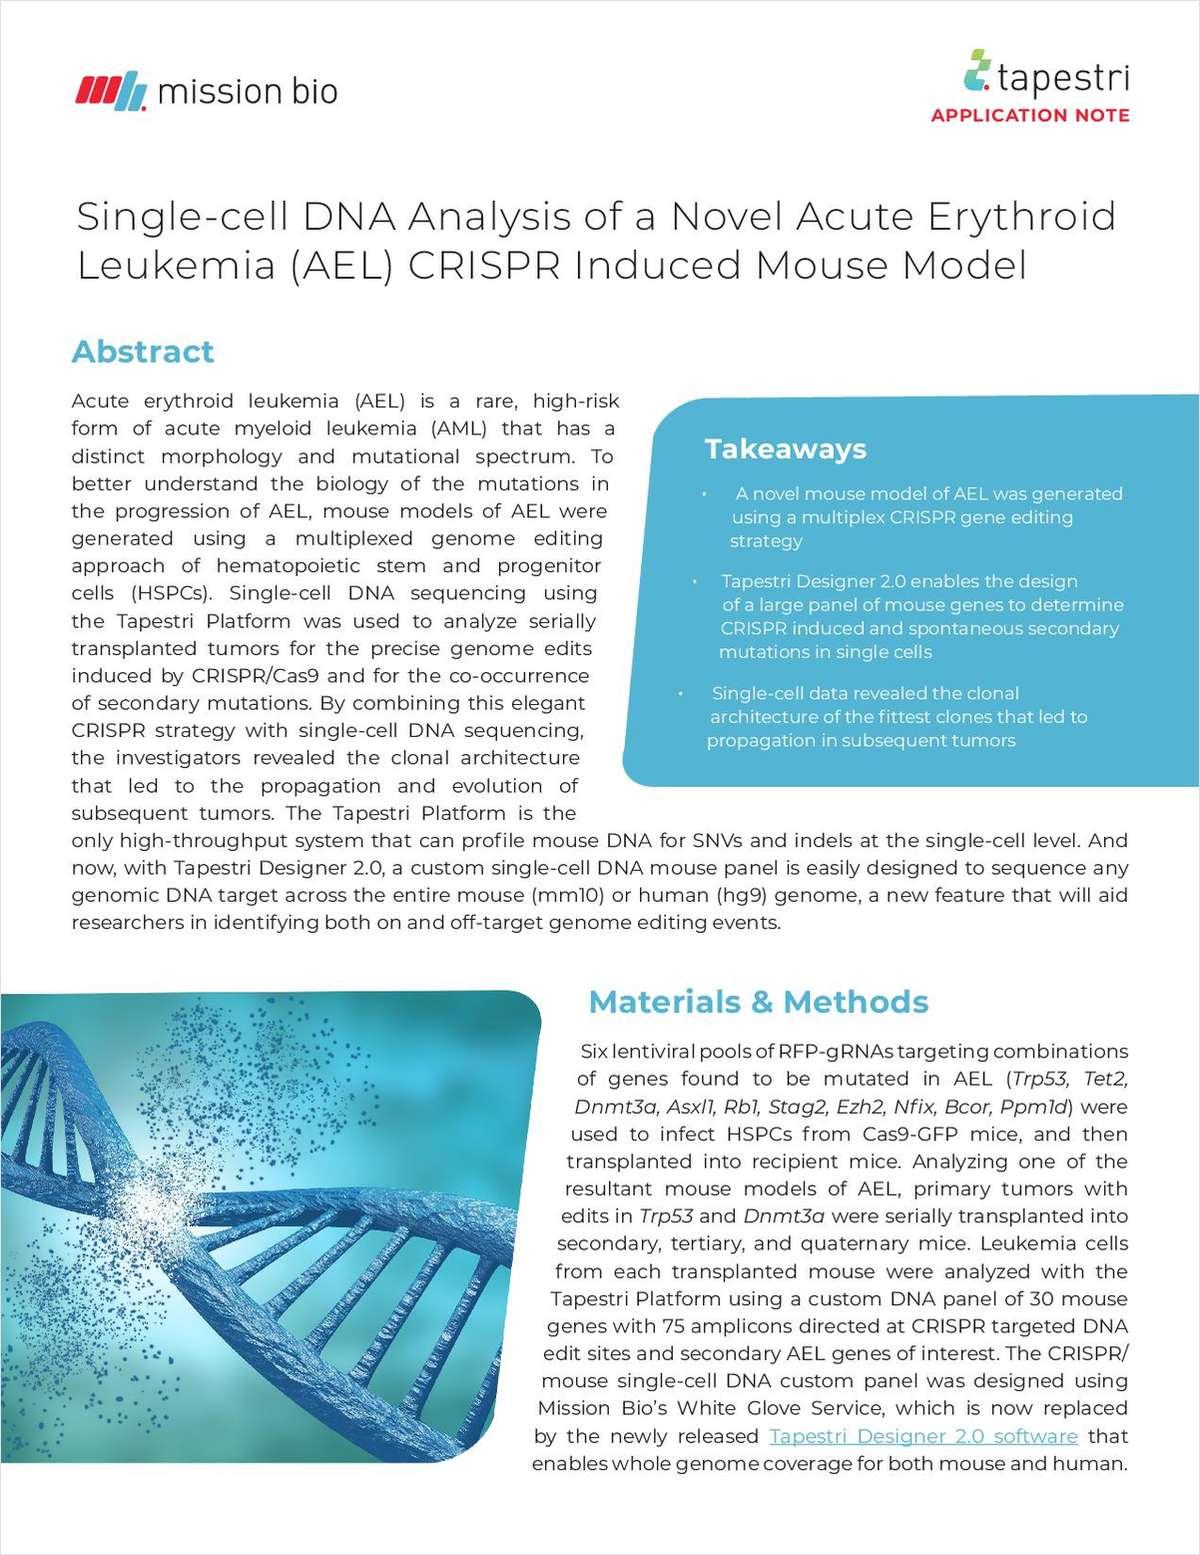 Single-cell DNA Analysis of a Novel Acute Erythroid Leukemia (AEL) CRISPR Induced Mouse Model